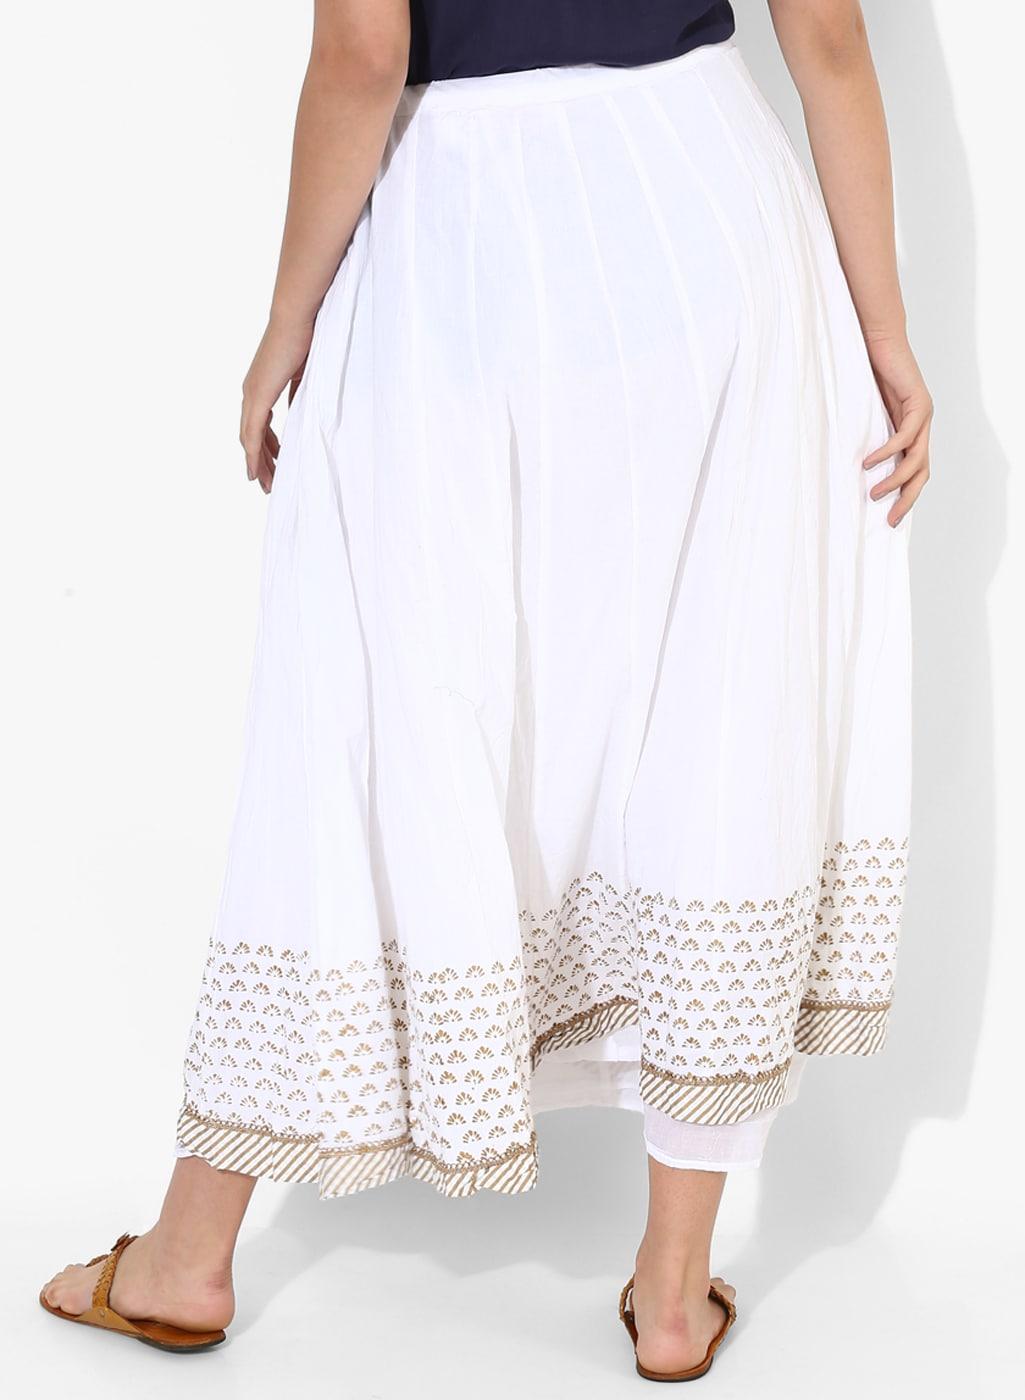 41b23b2de8 Women Skirts Biba - Buy Women Skirts Biba online in India - Jabong